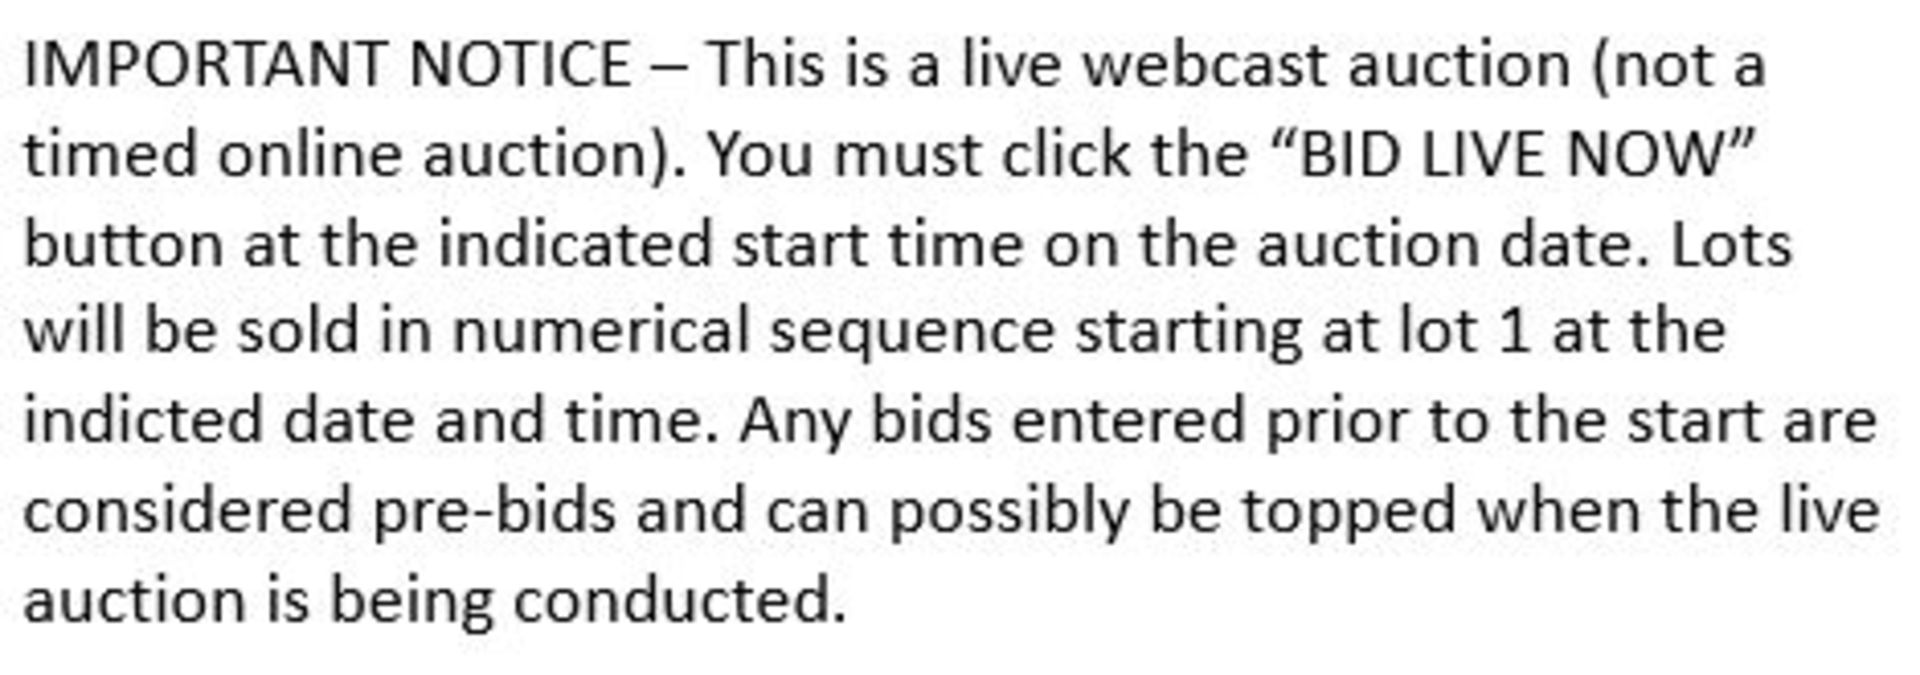 IMPORTANT NOTICE - LIVE WEBCAST AUCTION - Image 3 of 3